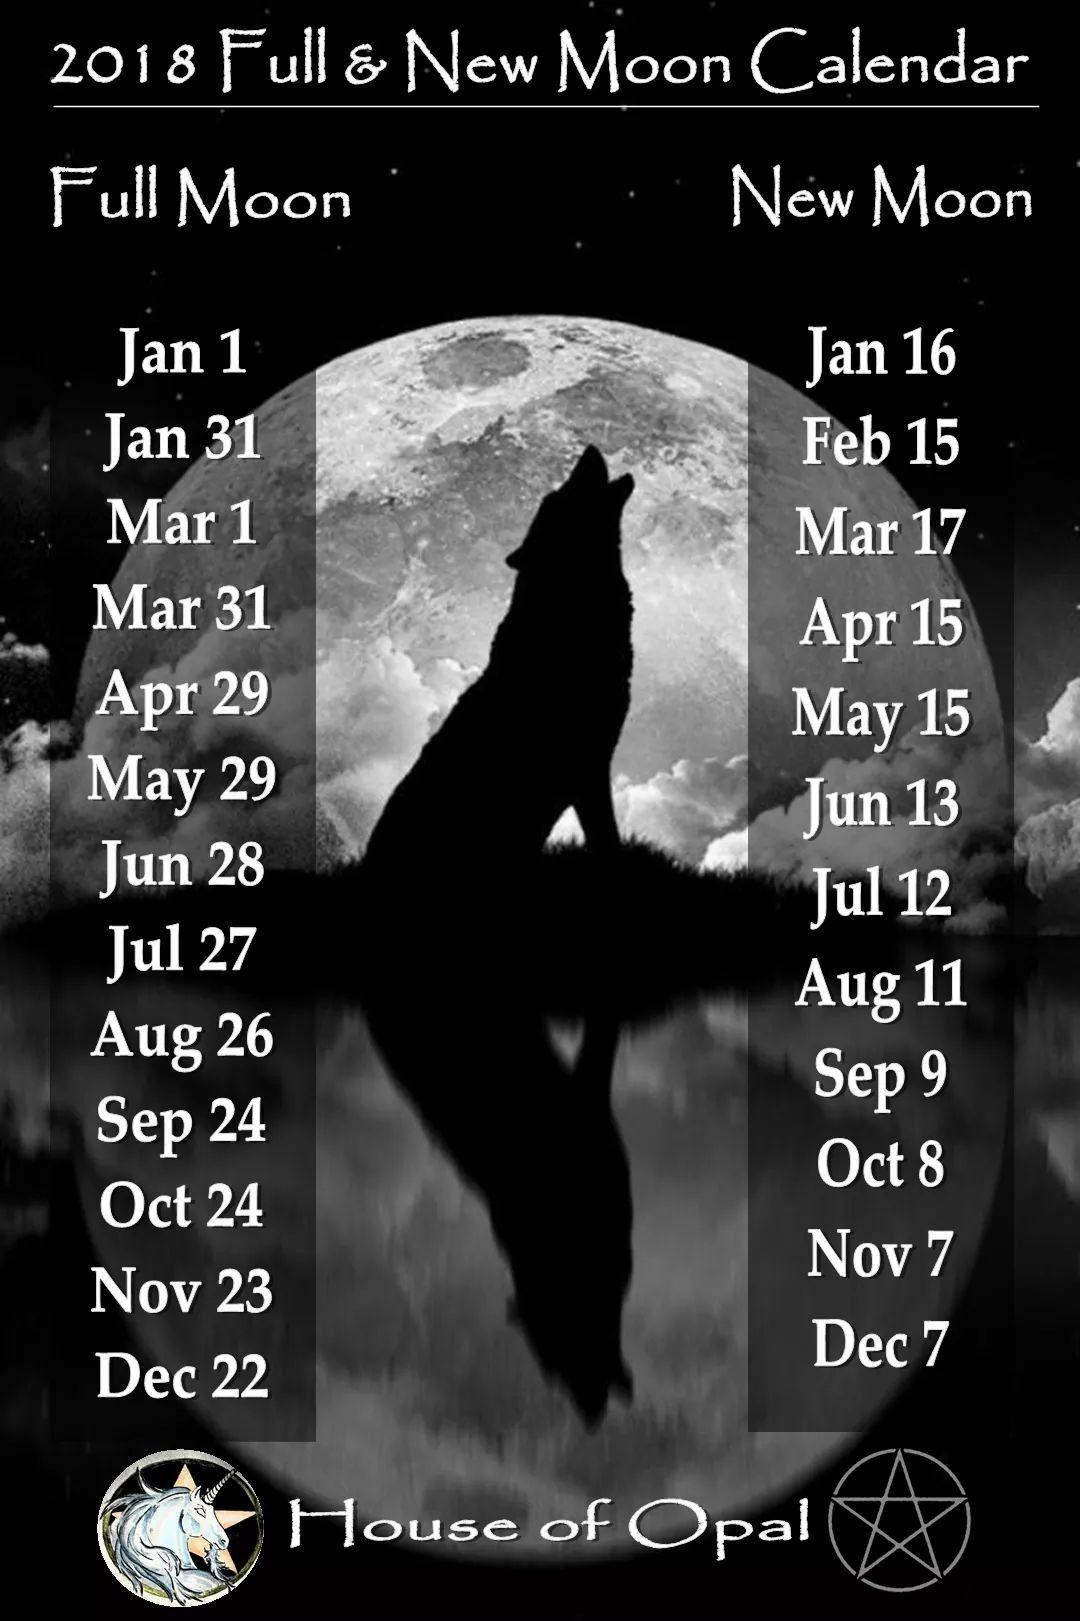 New Moon Calendar Image By Helen Scott Morgenstern On Many